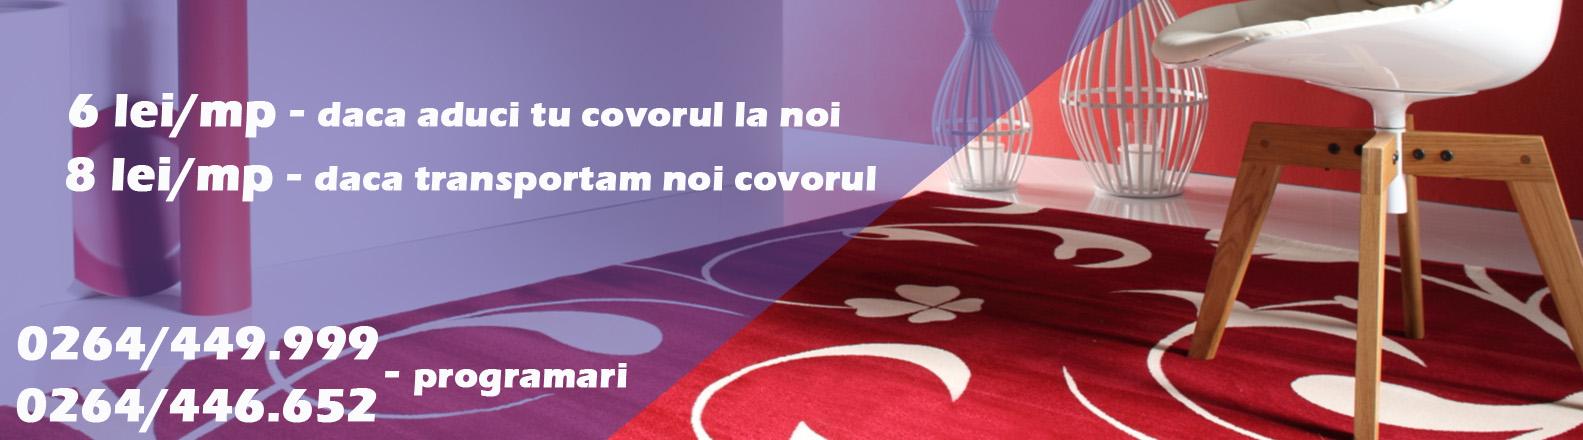 covor_curat_banner_bun